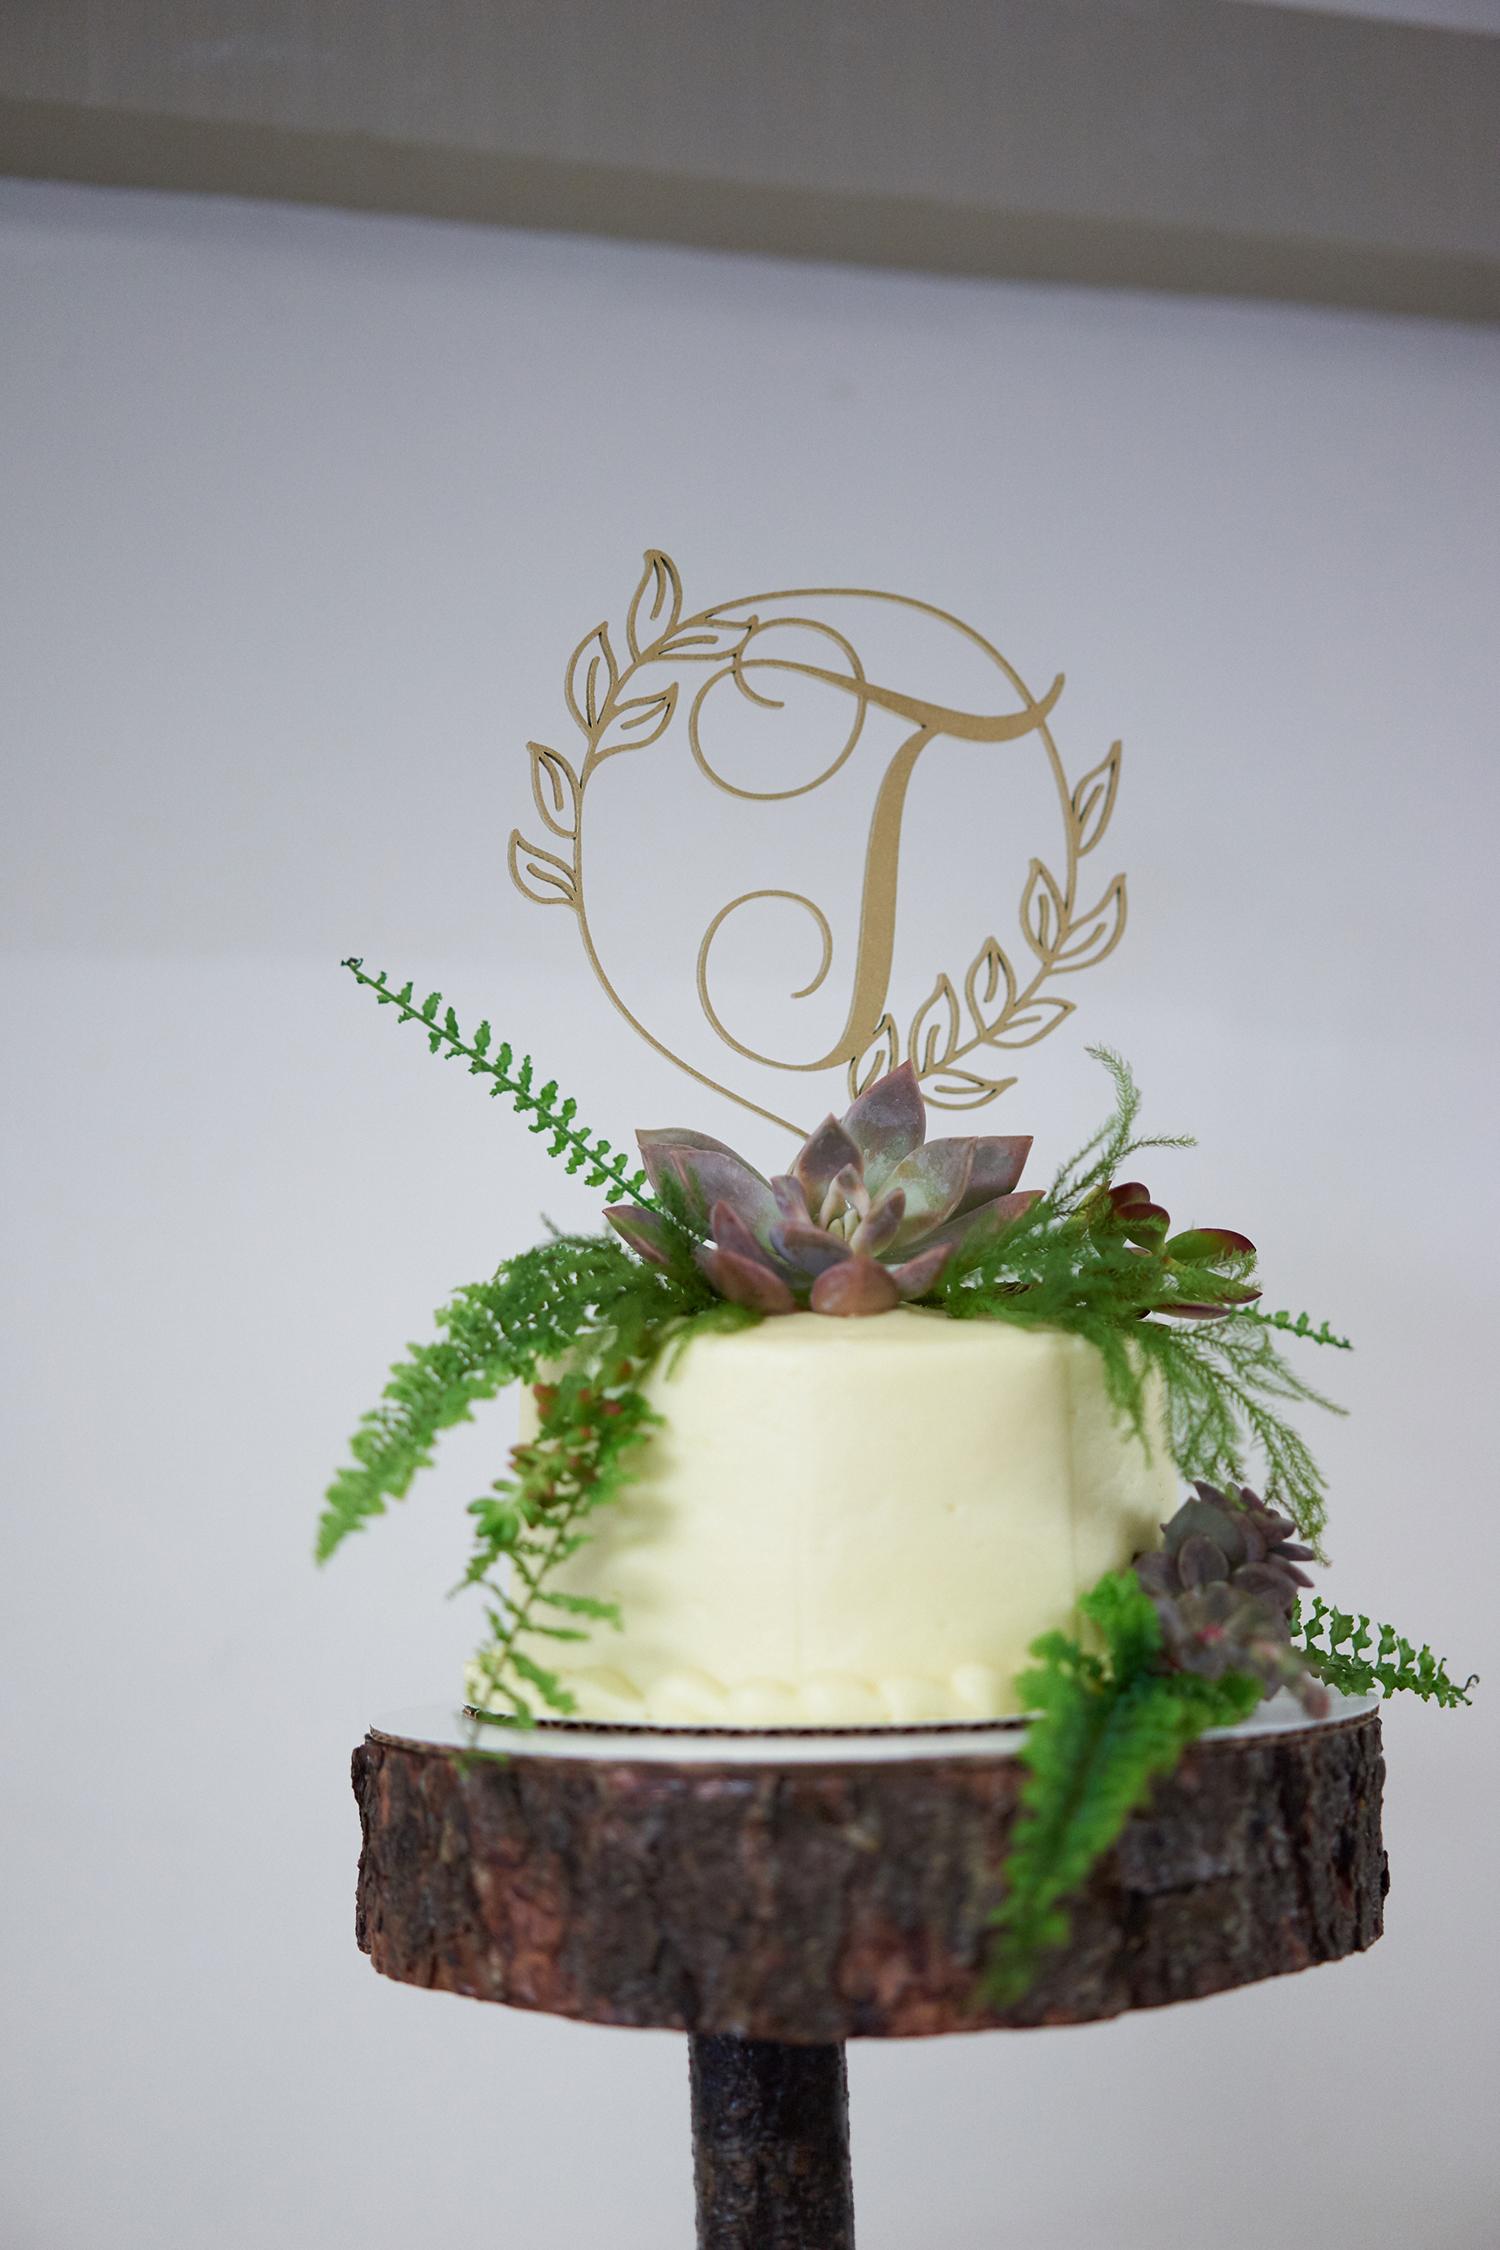 100717_Lenora_Jesse0552-weddingdress-bride-weddingphotography-best-weddingphotographer-bridal-groom-wedding-engagementring-proposal-brides-diamondring-sonyalpha-sony-sonya7rii-sanfrancisco-sf-bayarea-photographer-profoto-berkeley-botanical-garden.jpg